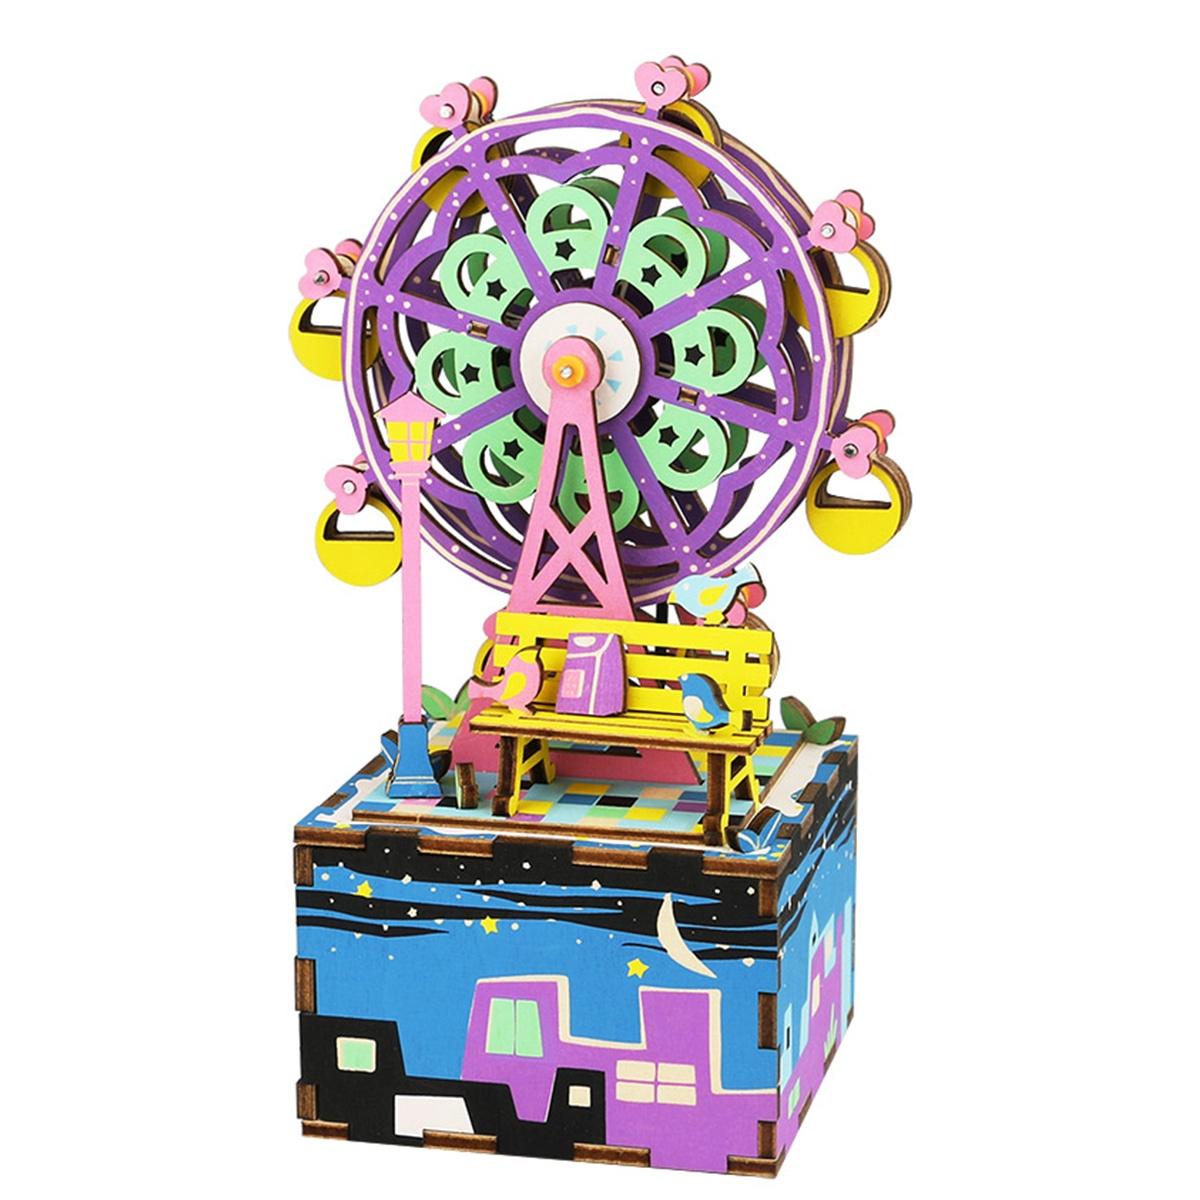 Деревянный конструктор Robotime Деревянный 3D конструктор - музыкальная шкатулка Ferris Wheel AM402 the ferris